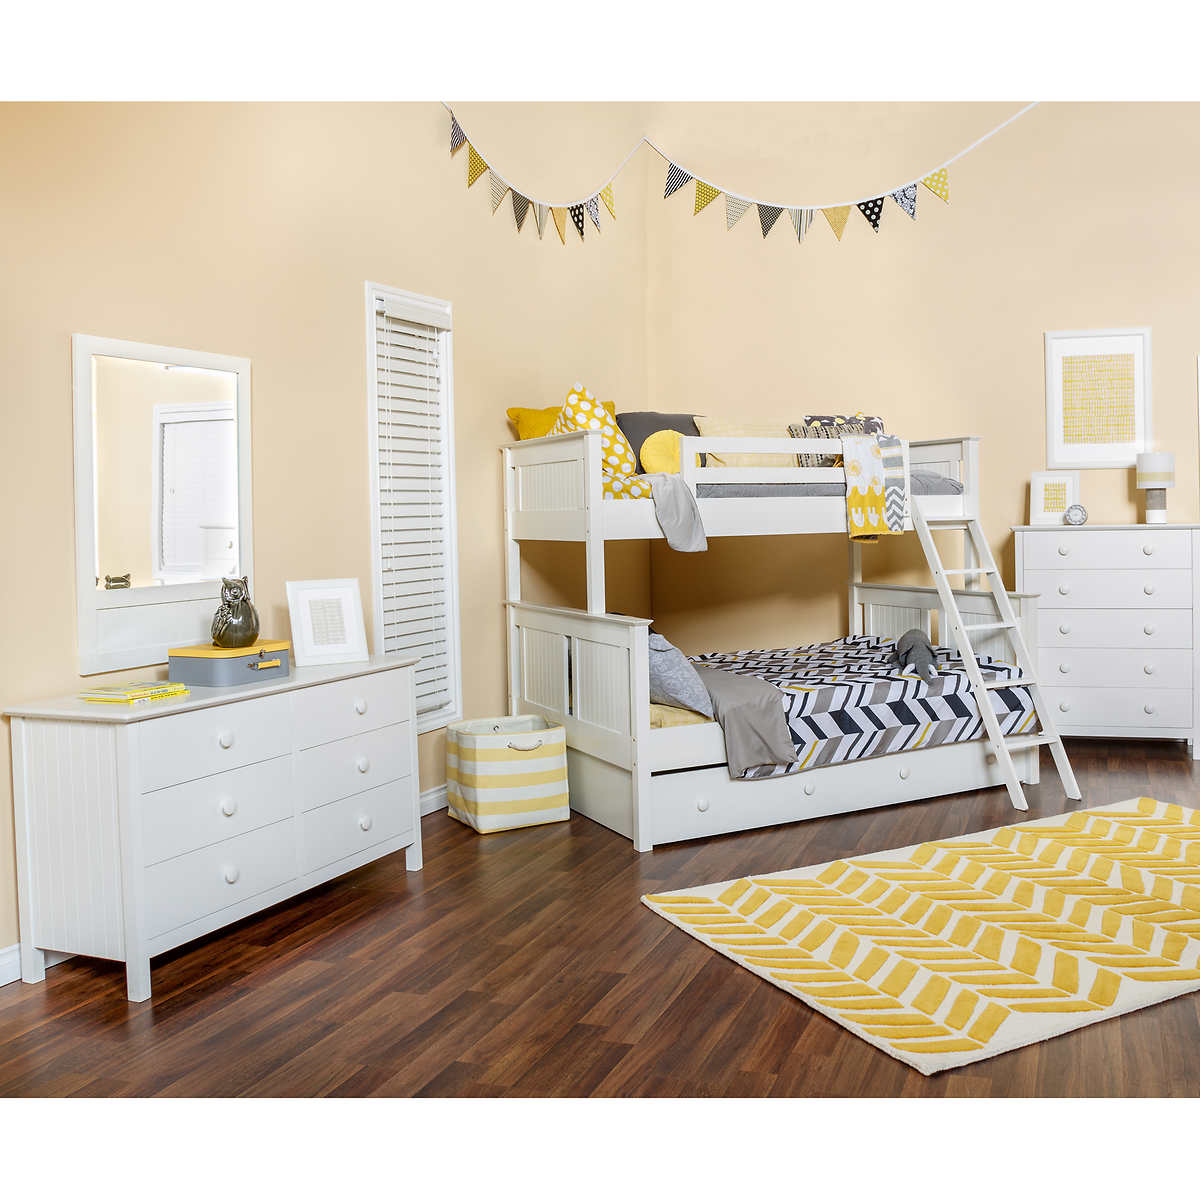 Baby jasper bed brackets - Dakota 4 Piece Twin Over Full Trundle Bunkbed Set